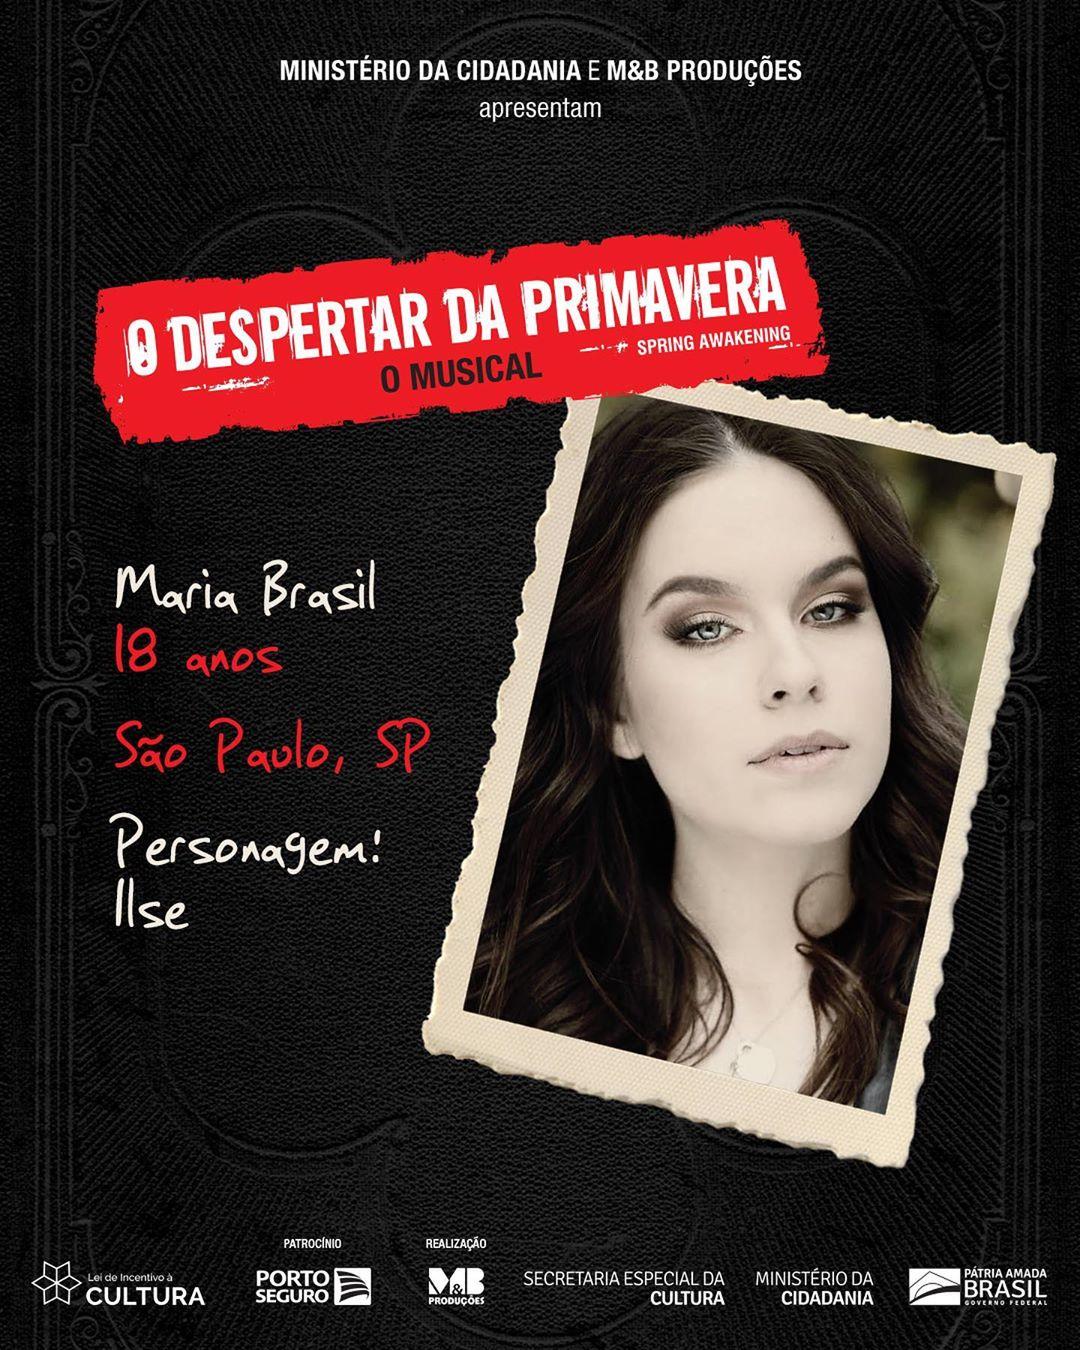 https://mundodosmusicais.files.wordpress.com/2019/09/maria-brasil.jpg